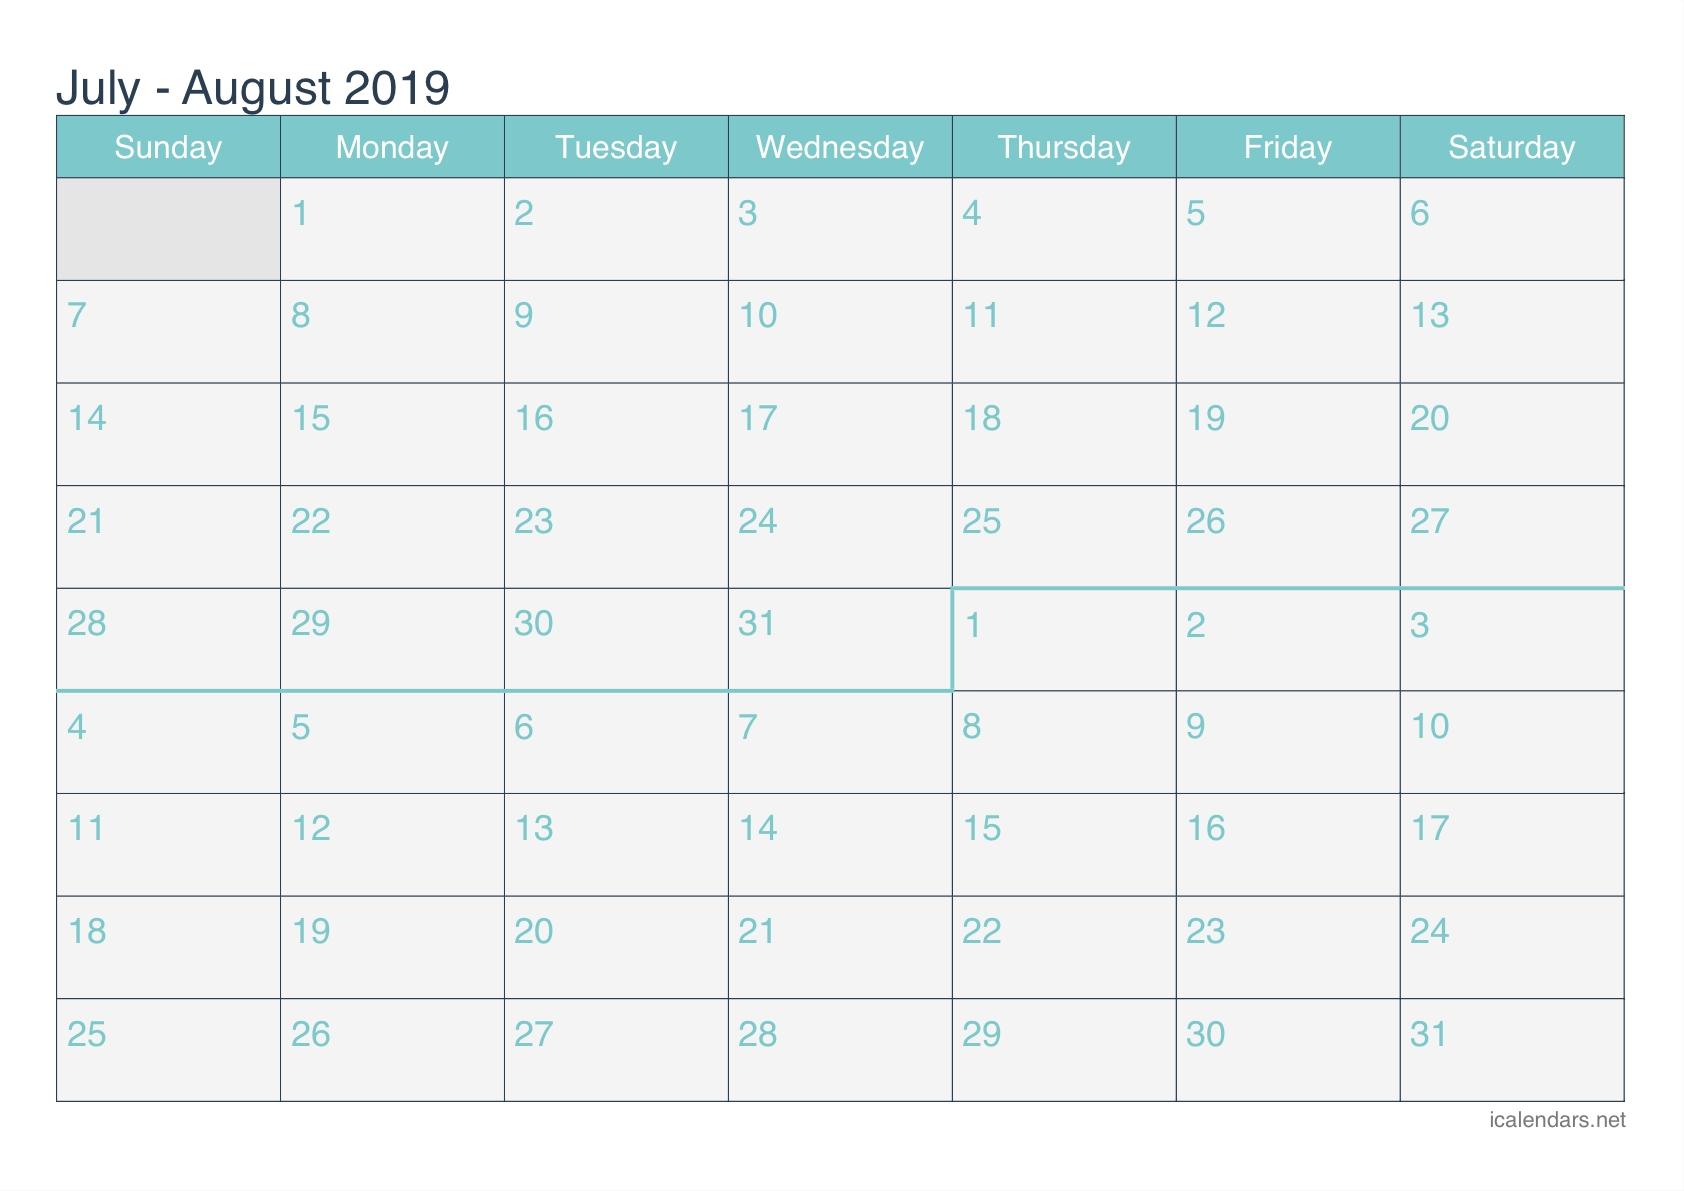 July And August 2019 Printable Calendar - Icalendars-Blank Calendar June July August